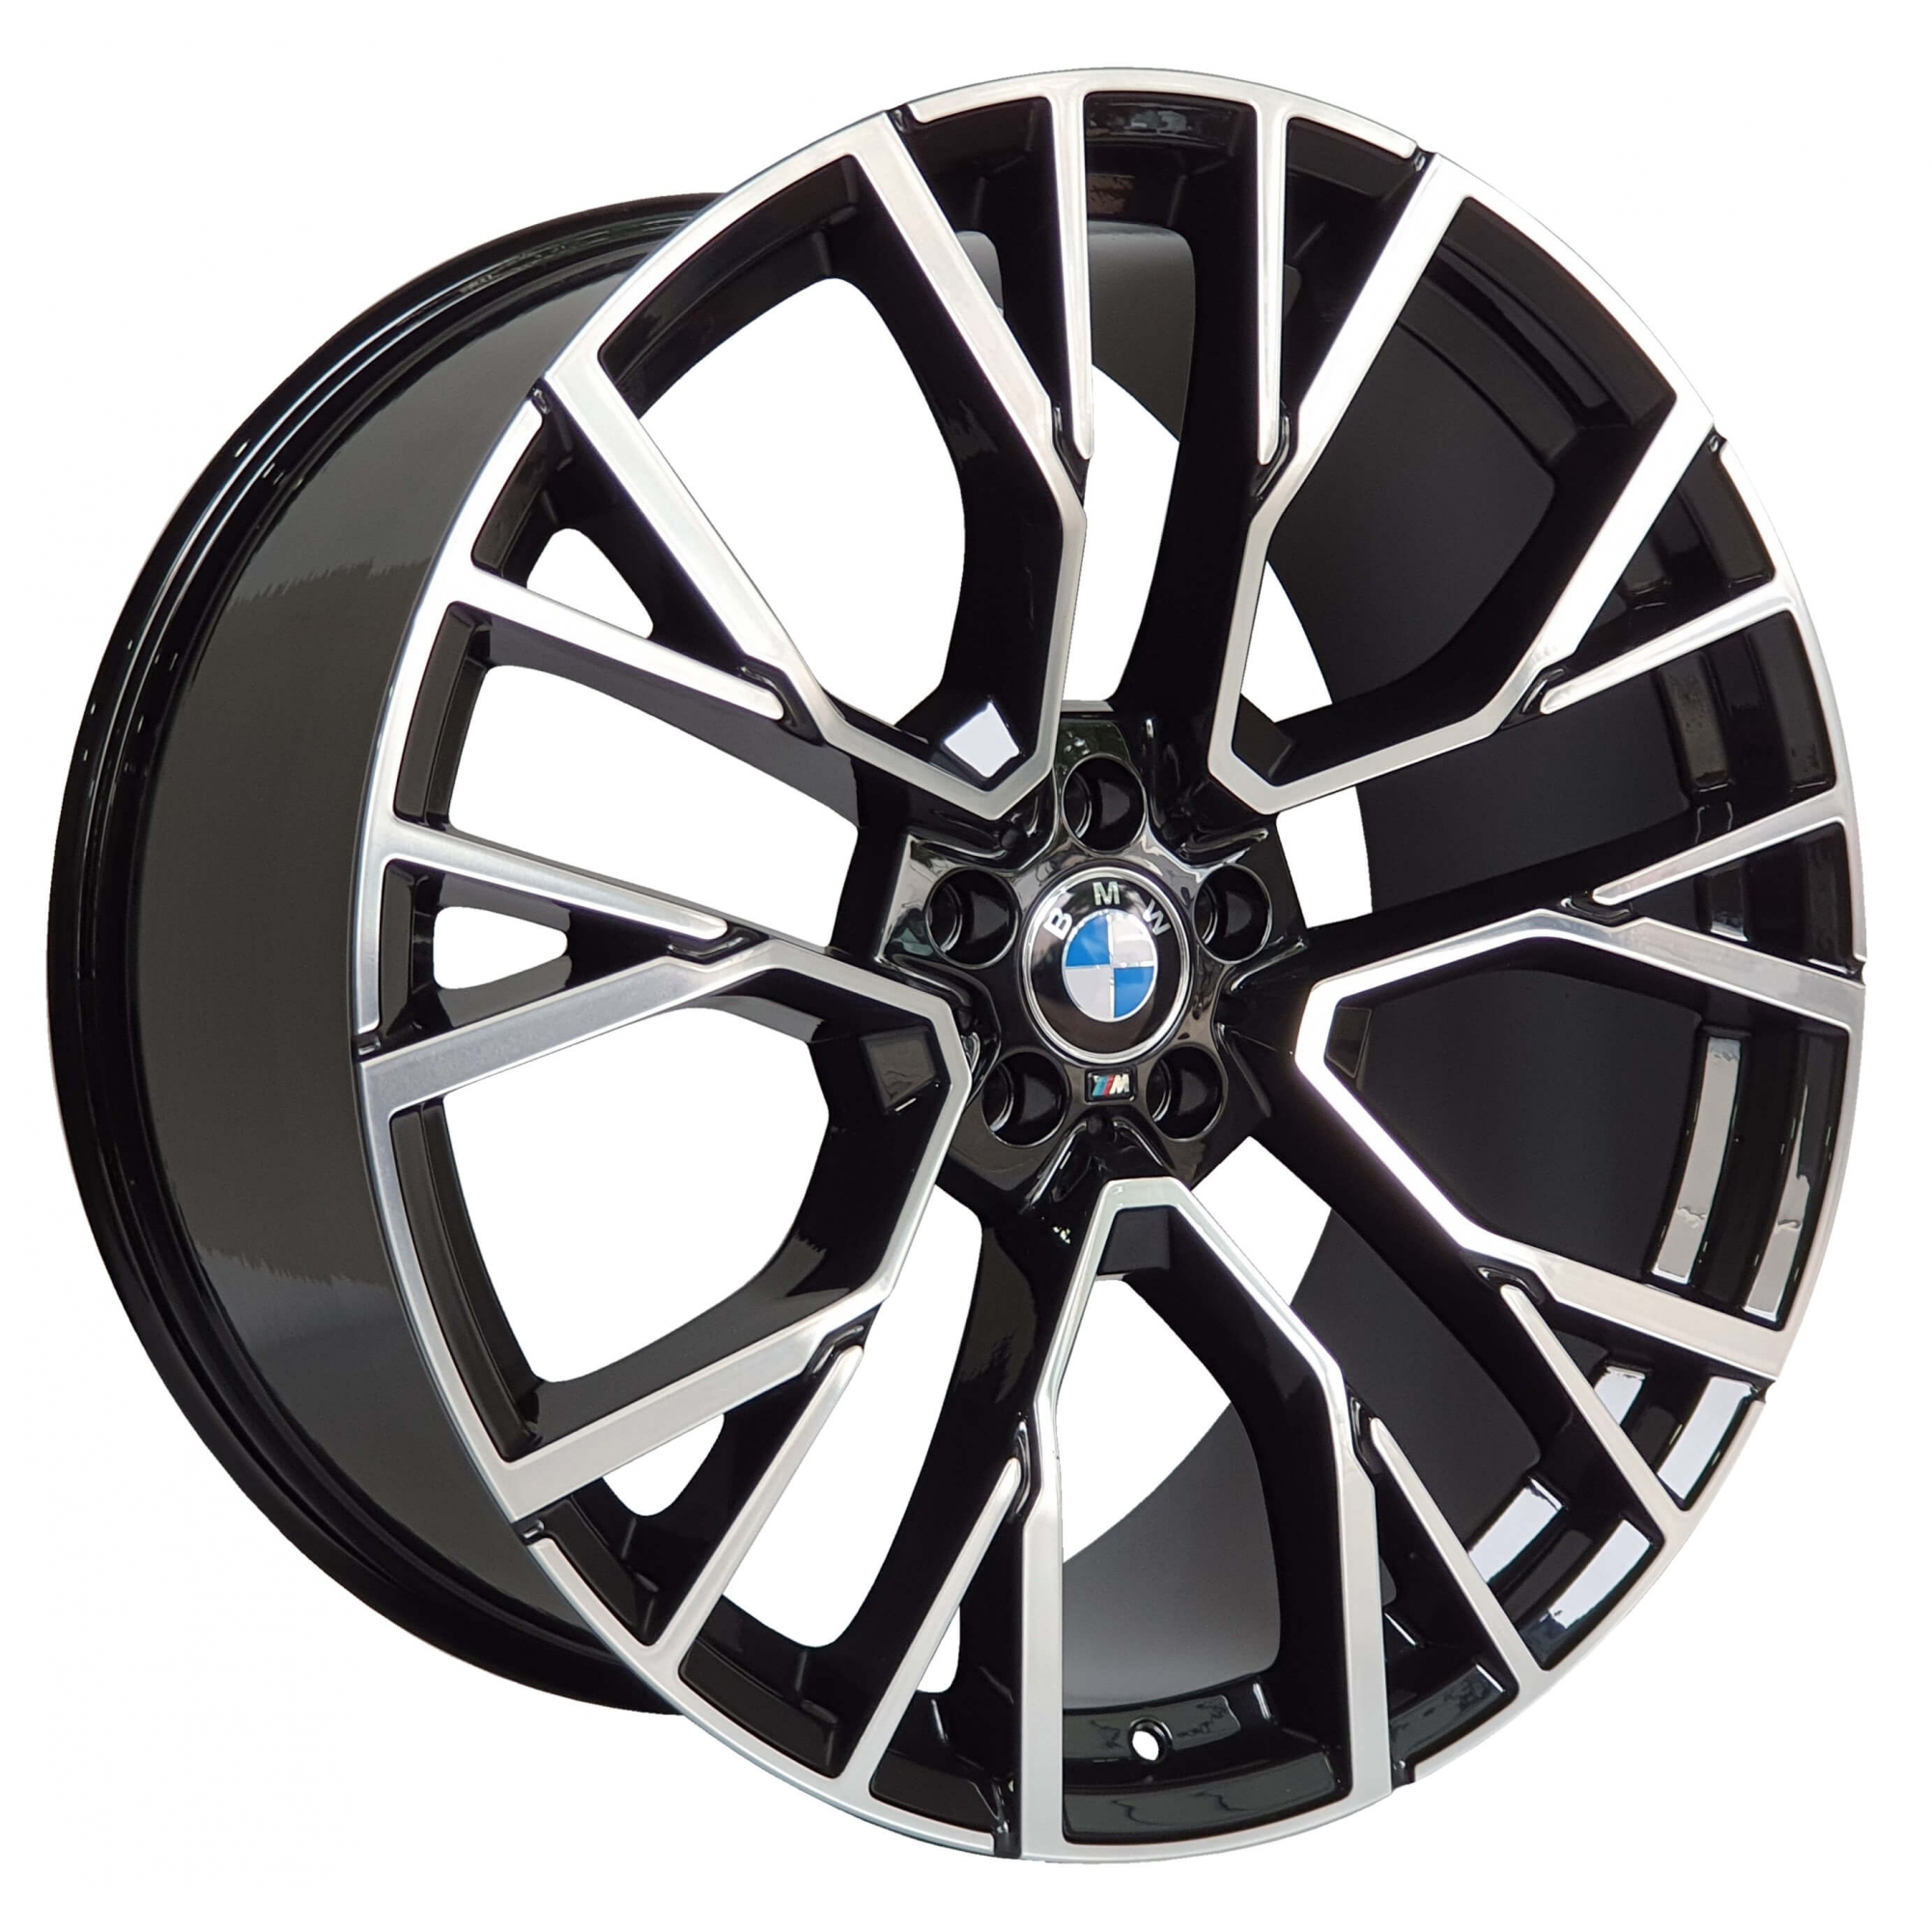 Jogo Rodas Zeus BMW X5M 5601A Aro 22x9,5 5x112 Black Diamond